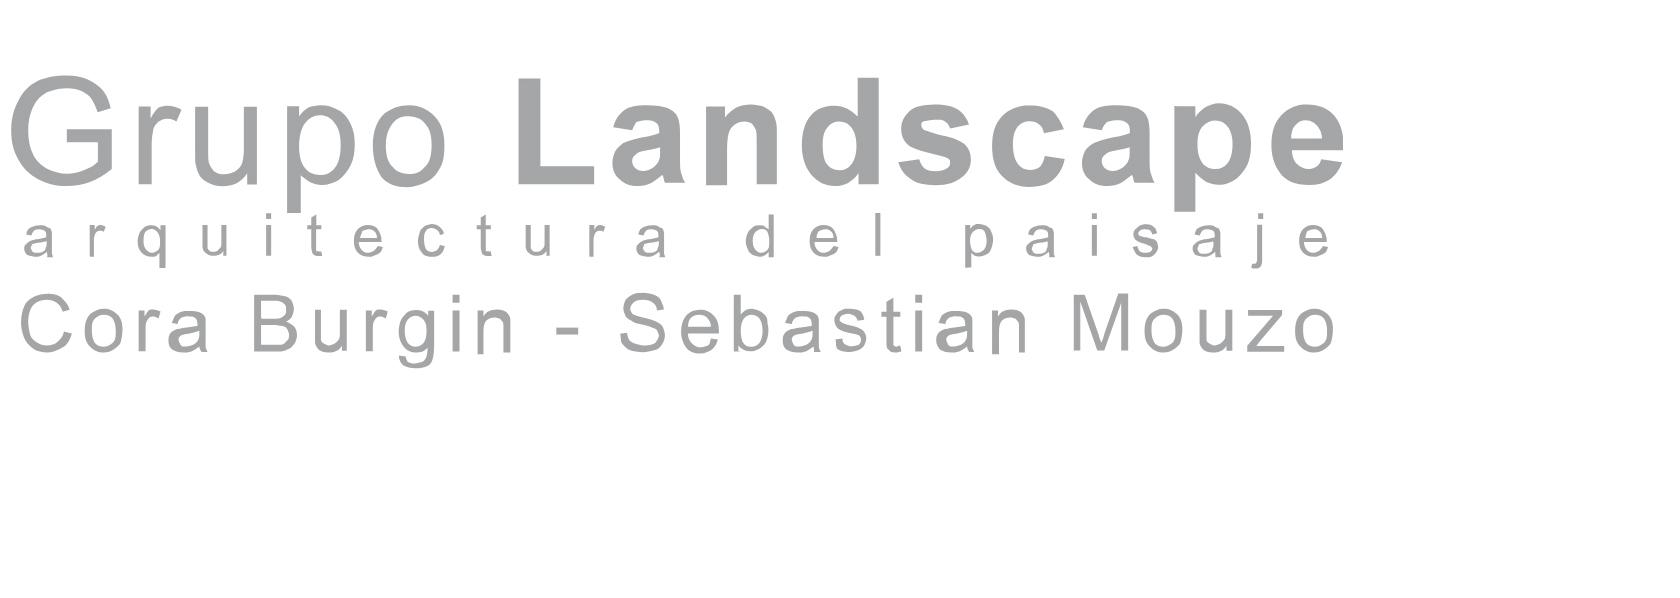 Grupo Landscape